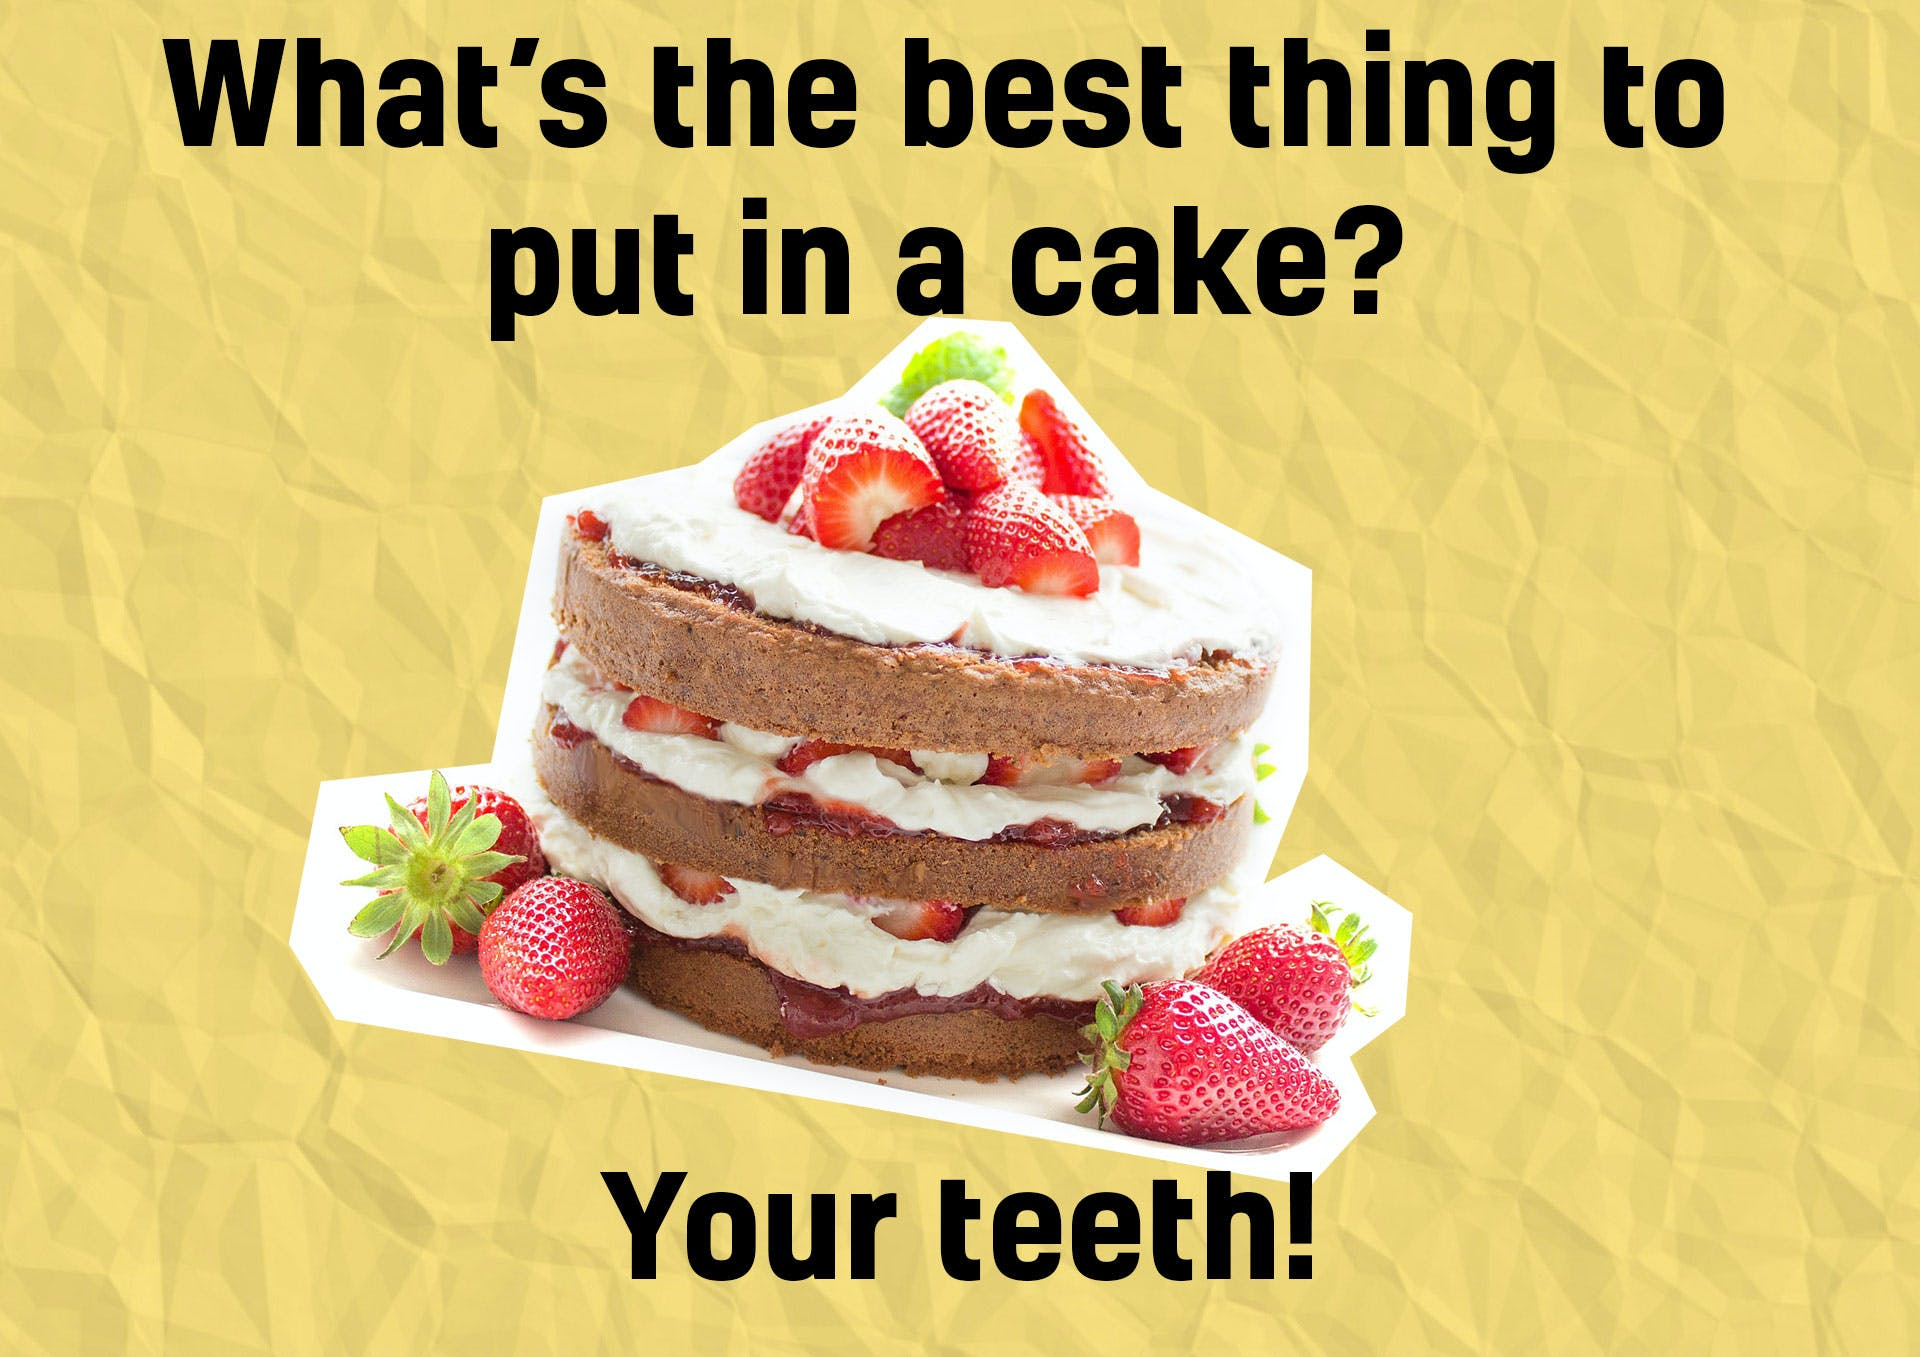 Cake joke